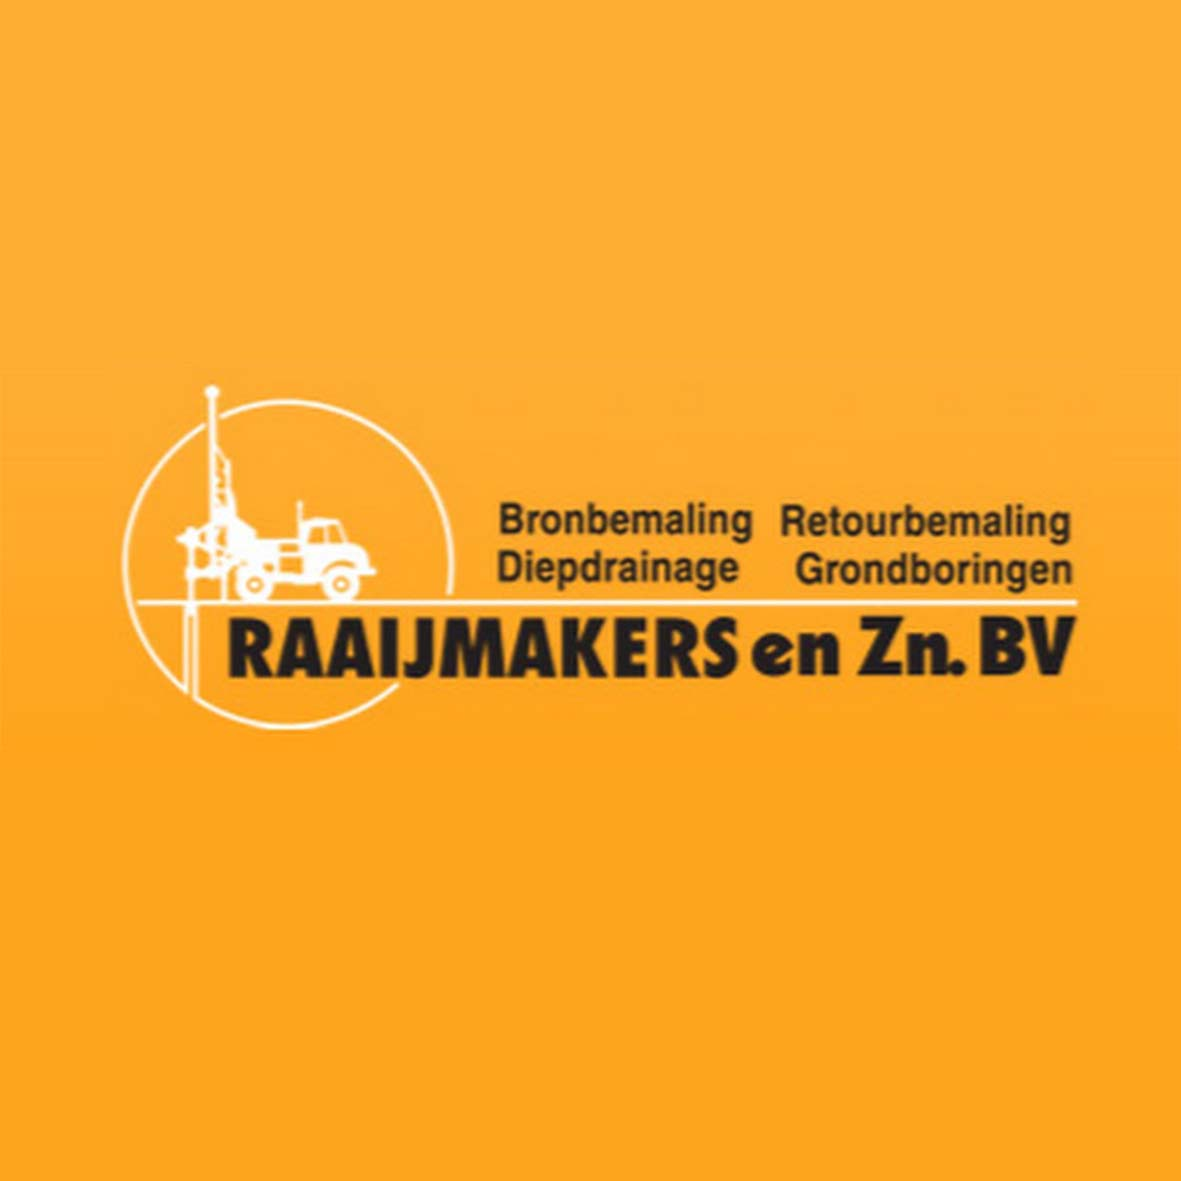 Raaijmakers